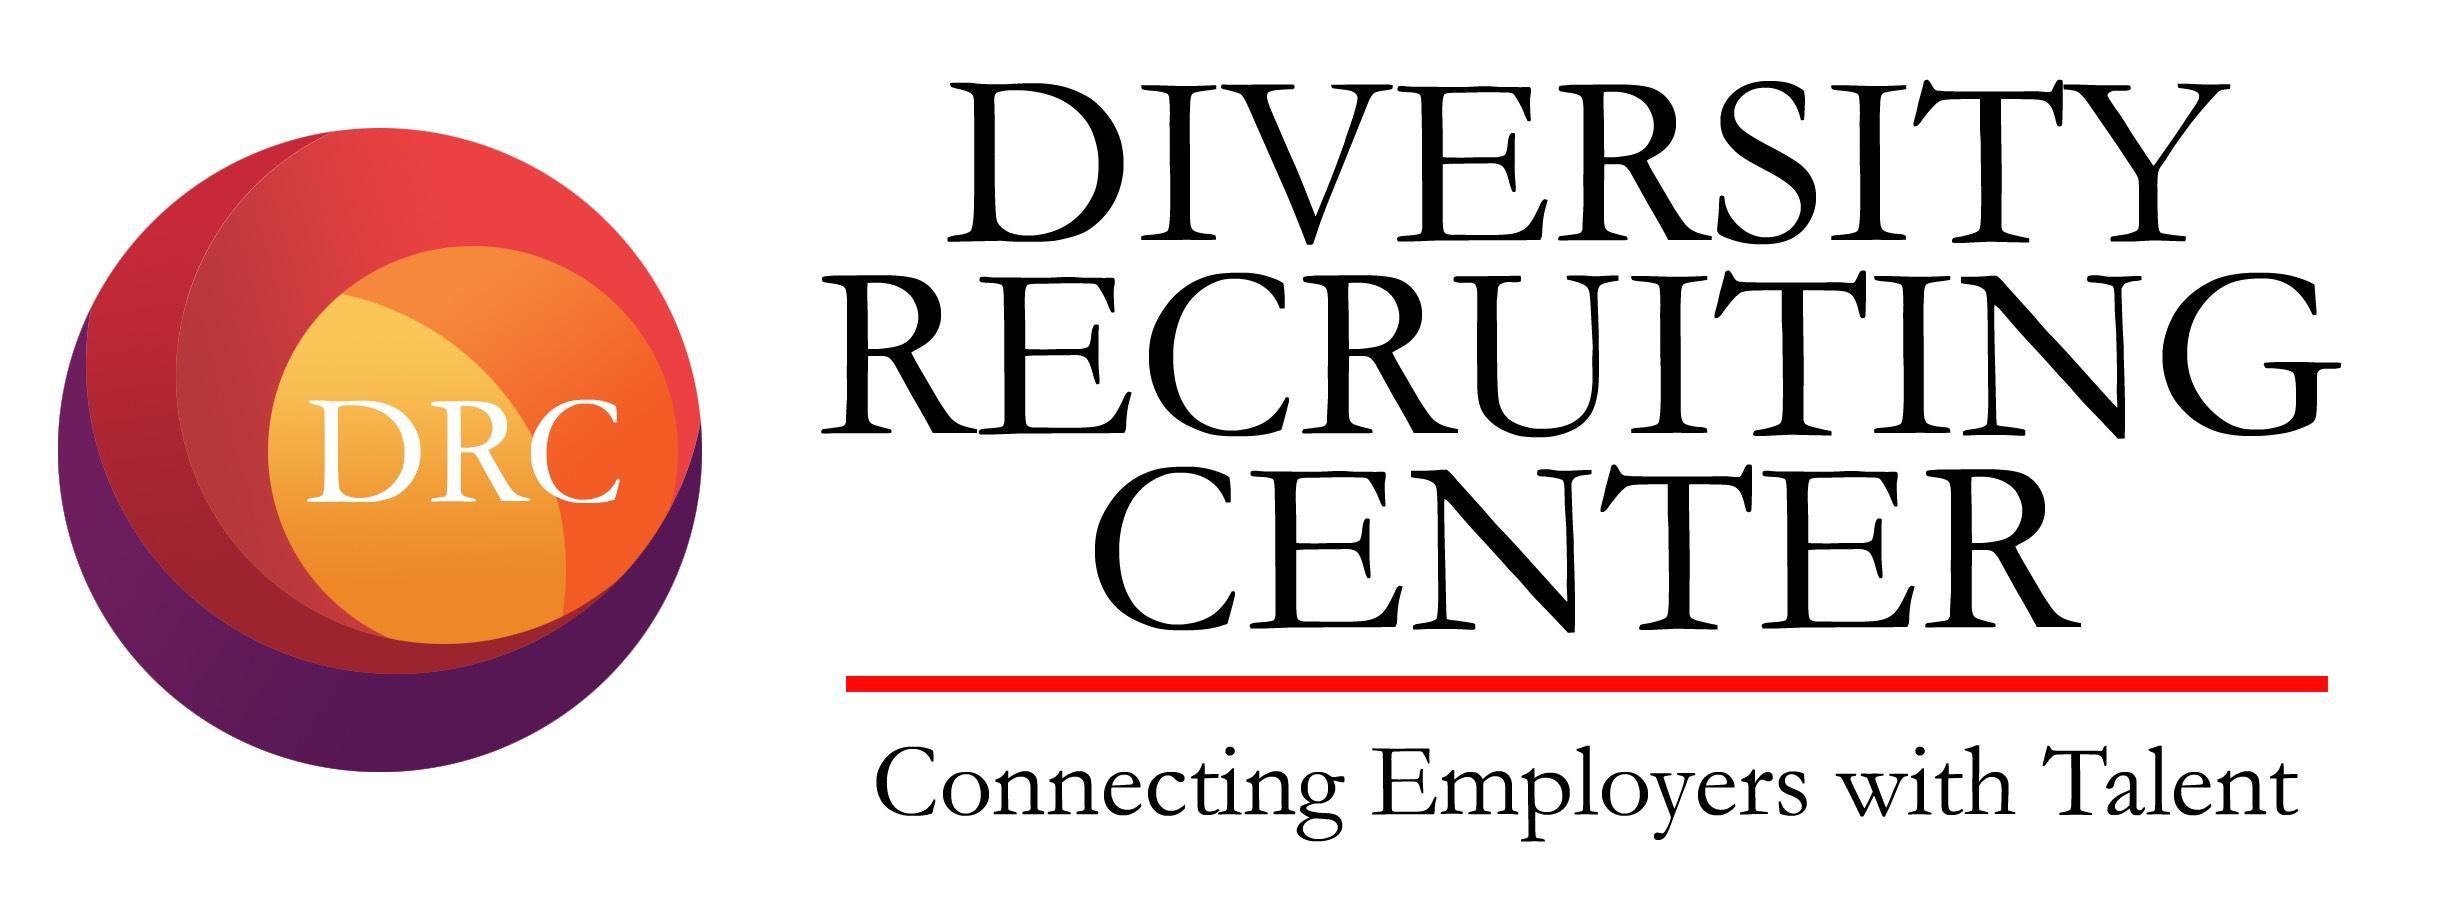 Diversity Recruiting Center